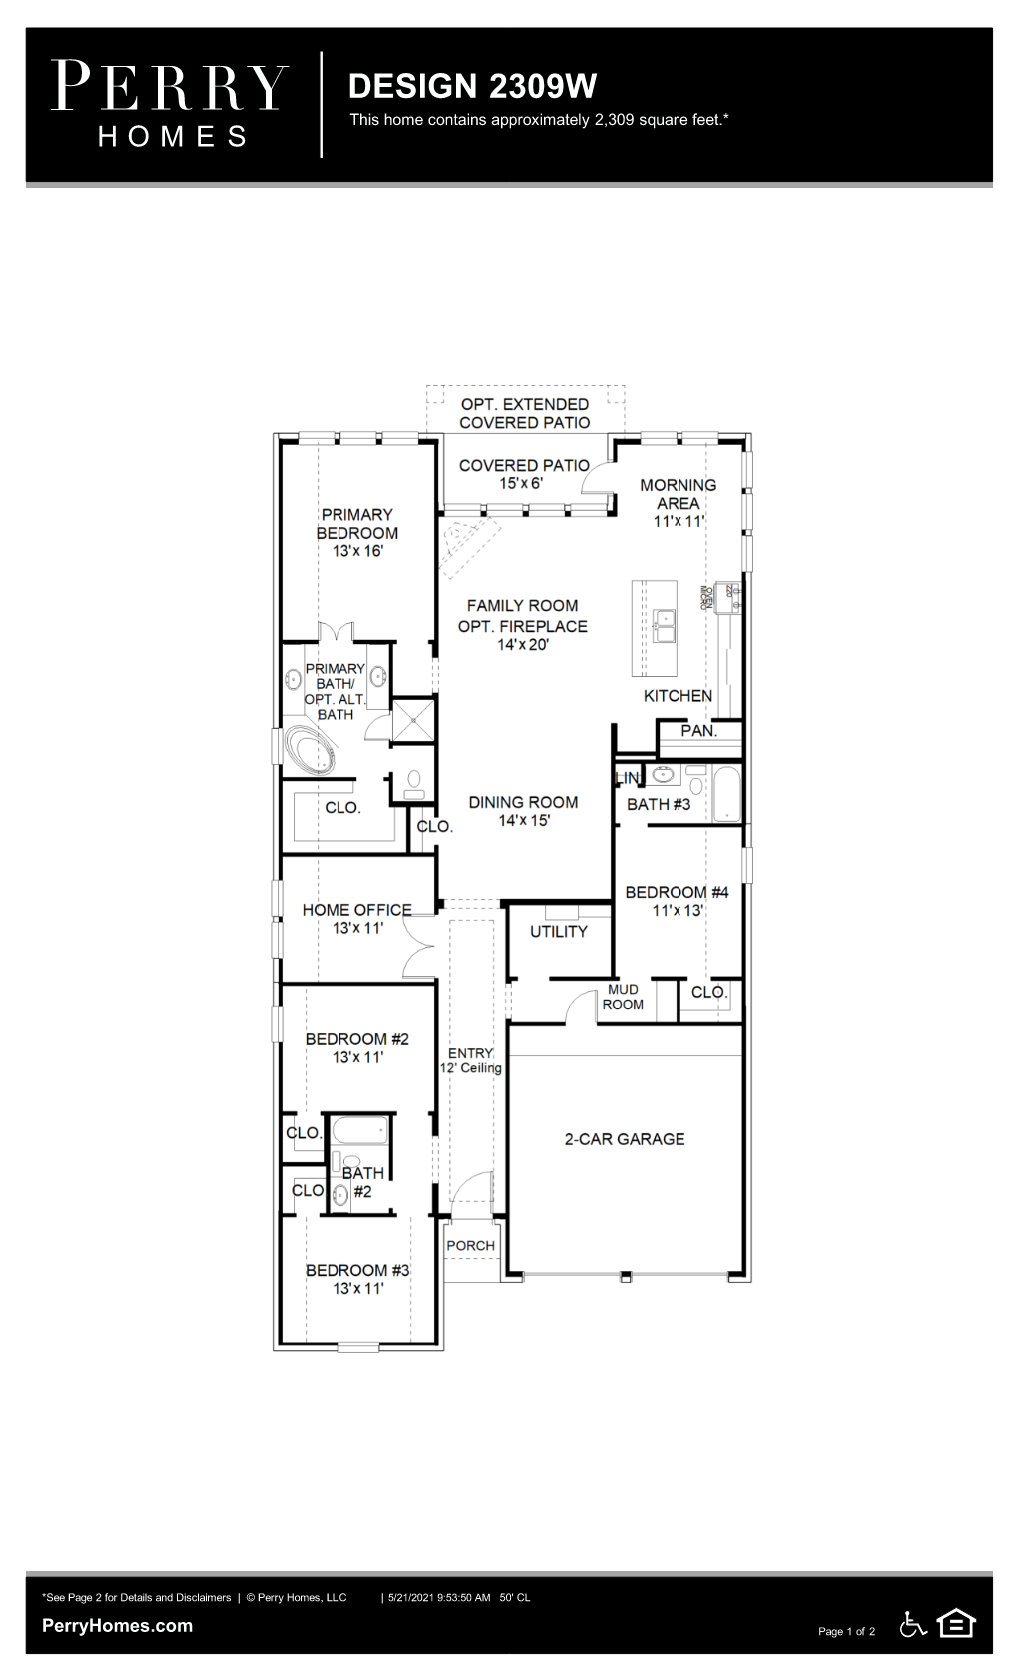 Floor Plan for 2309W